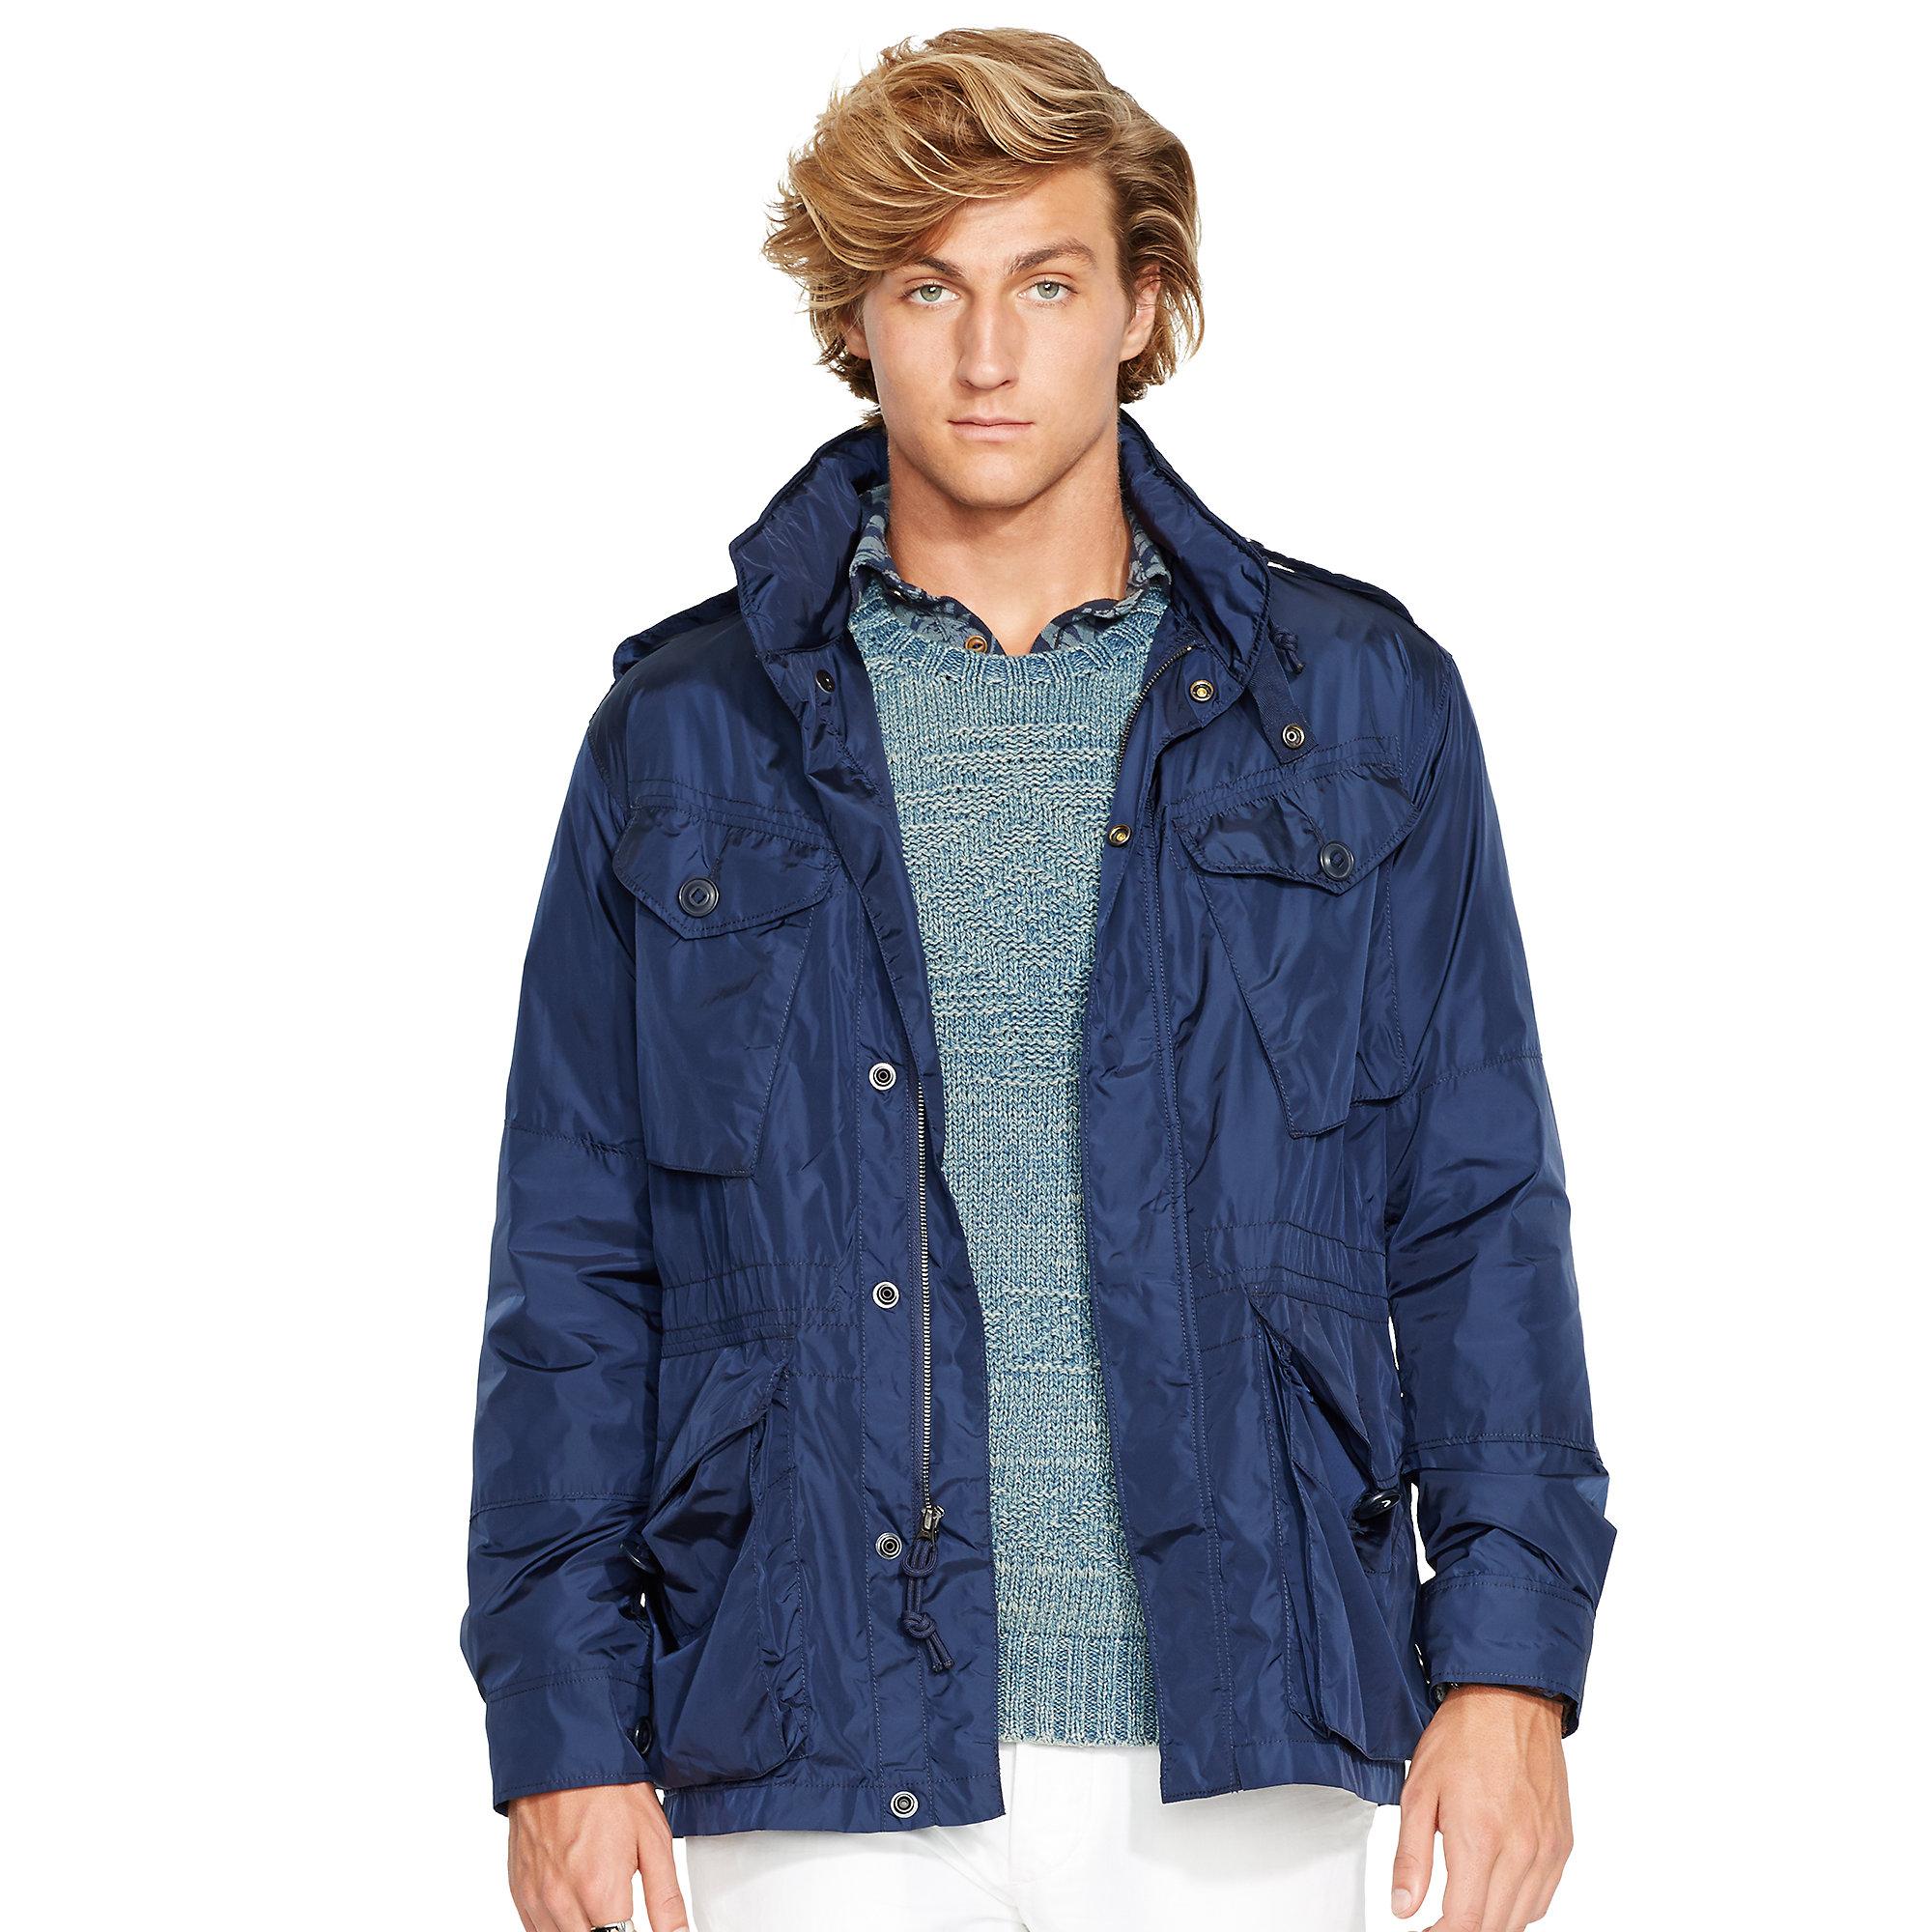 quilted fmt wid lifestyle produt quilt jacket men hei clothing image jackets lauren mens ralph